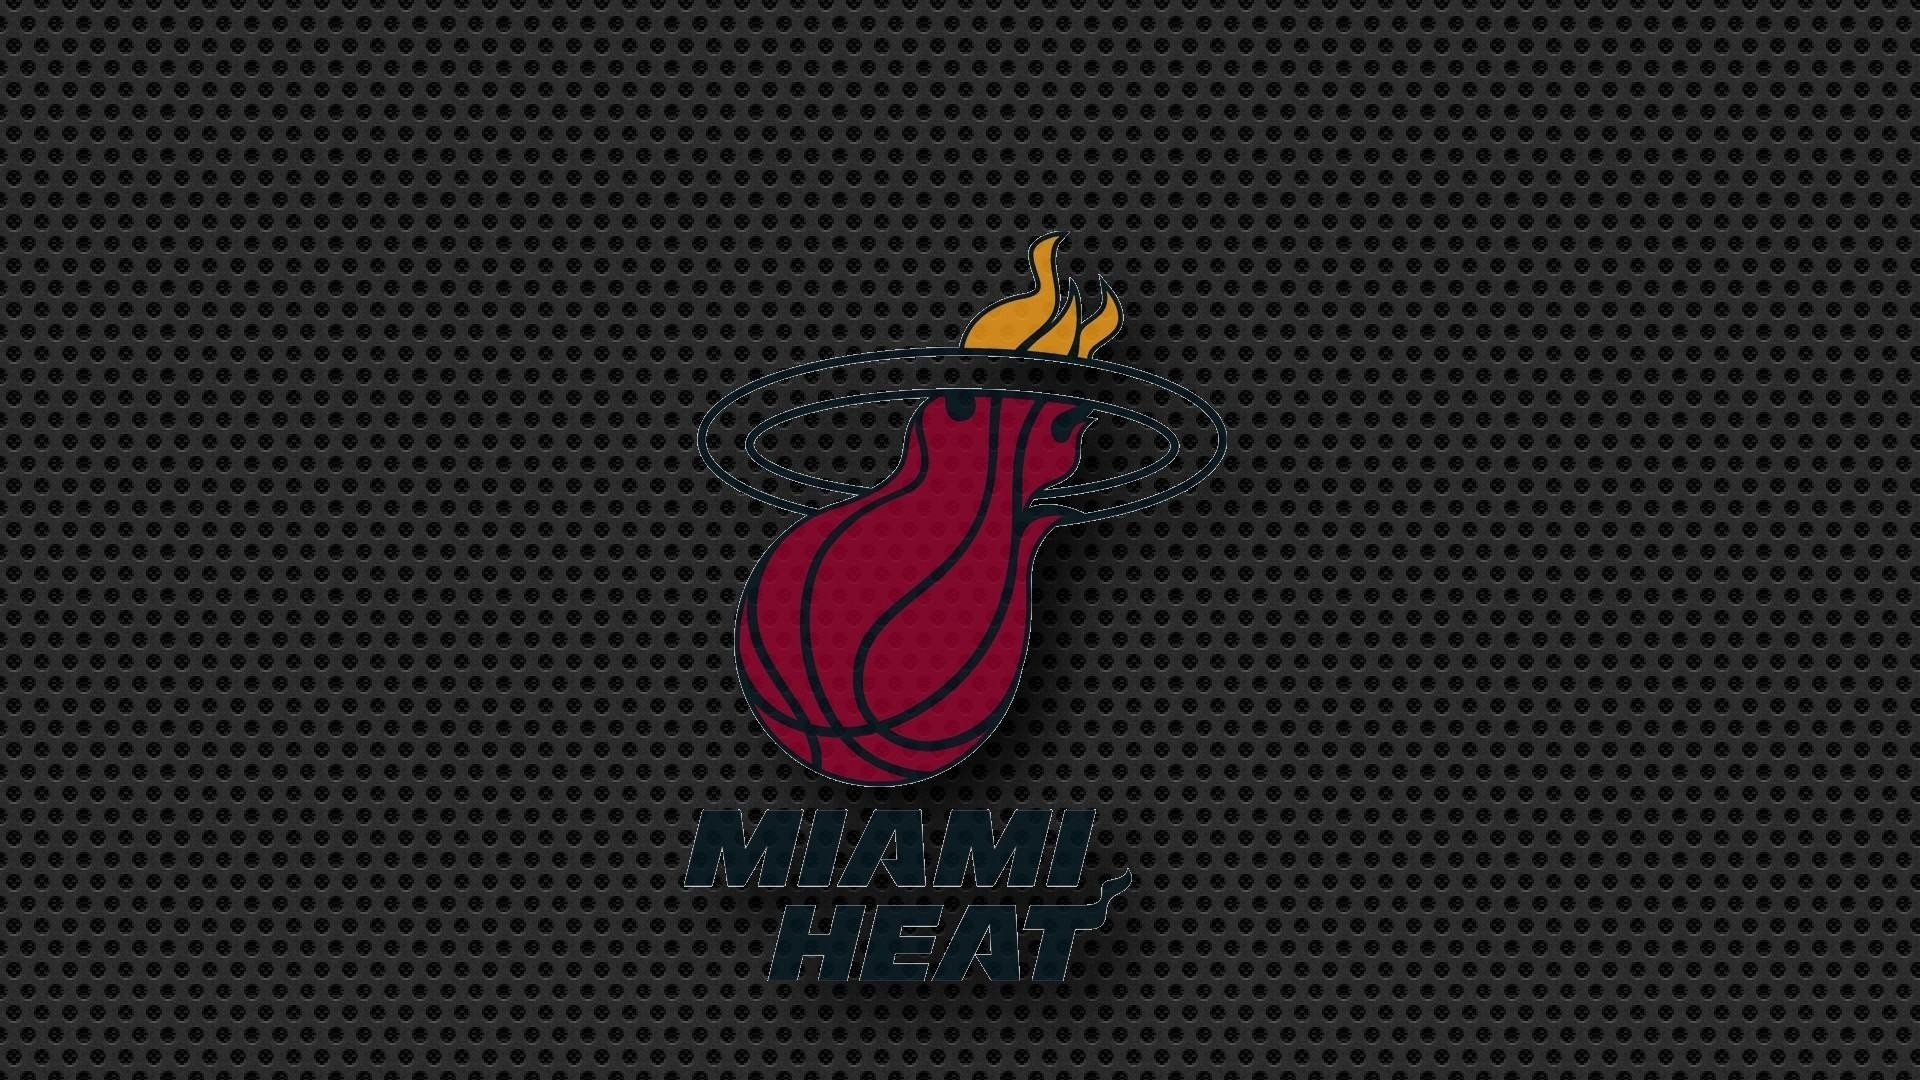 Miami Heat Download Wallpaper